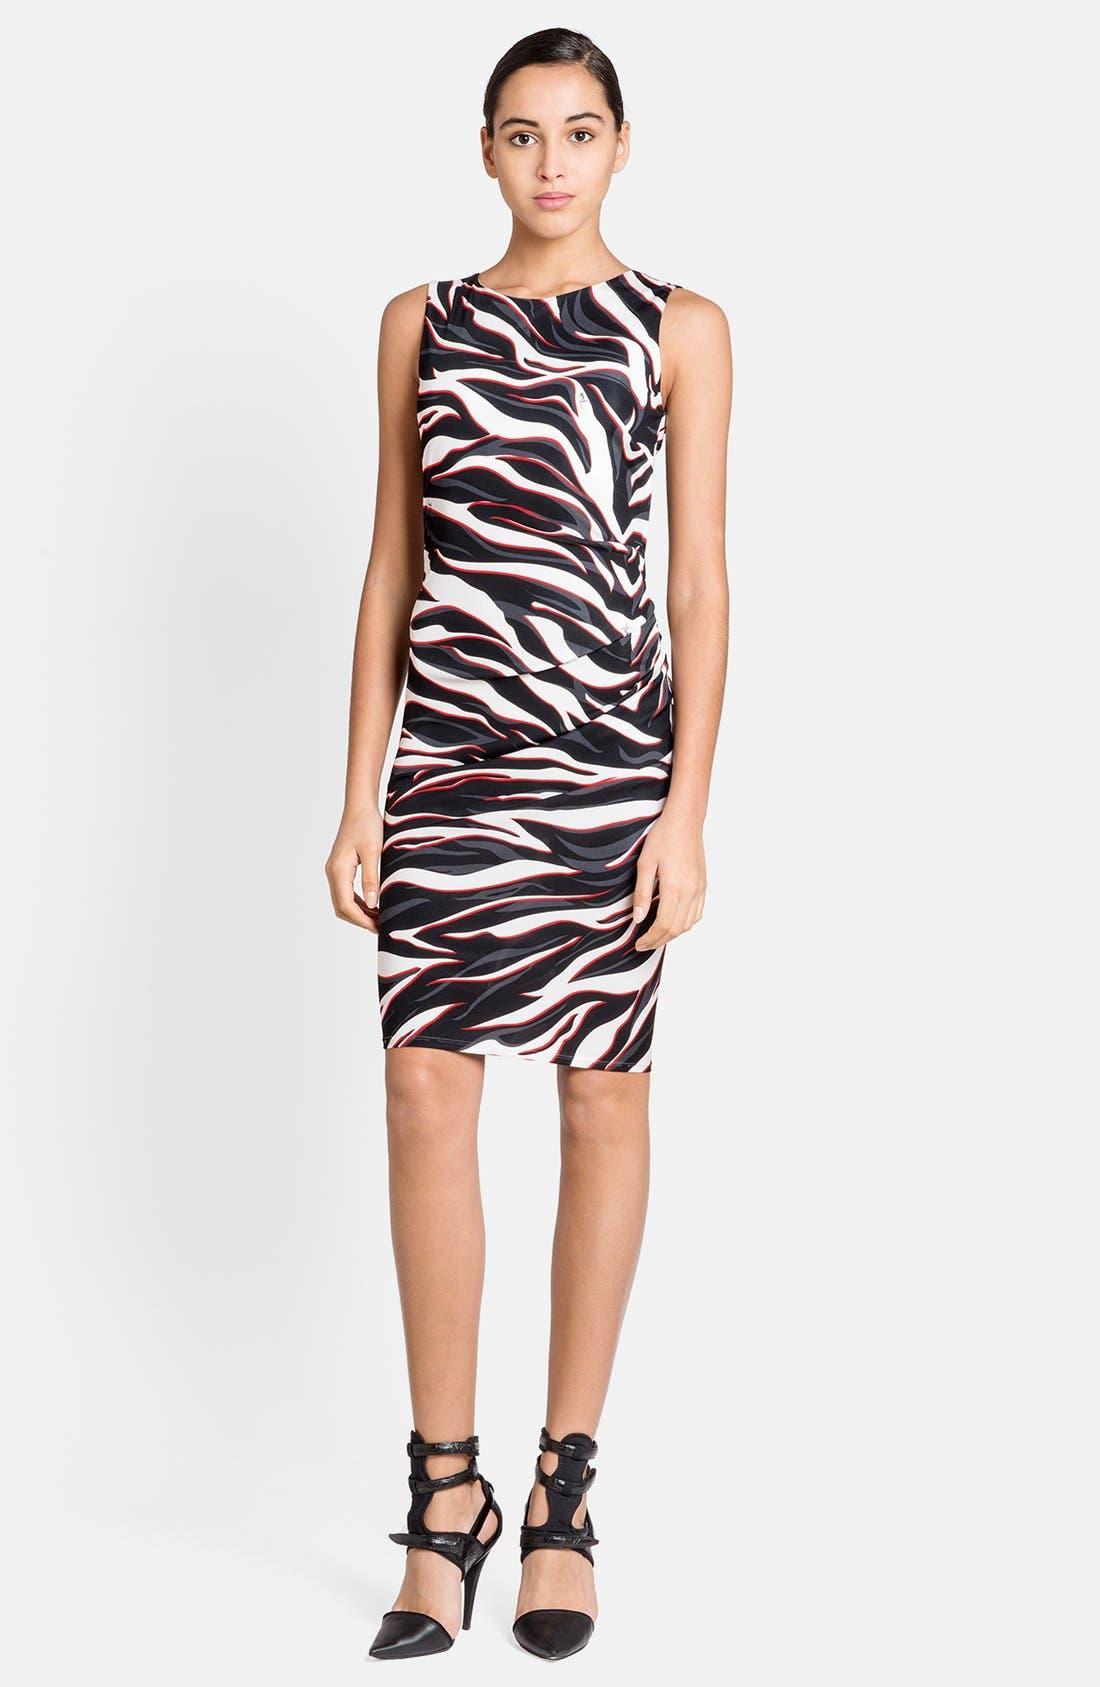 Main Image - Emilio Pucci Zebra Print Dress